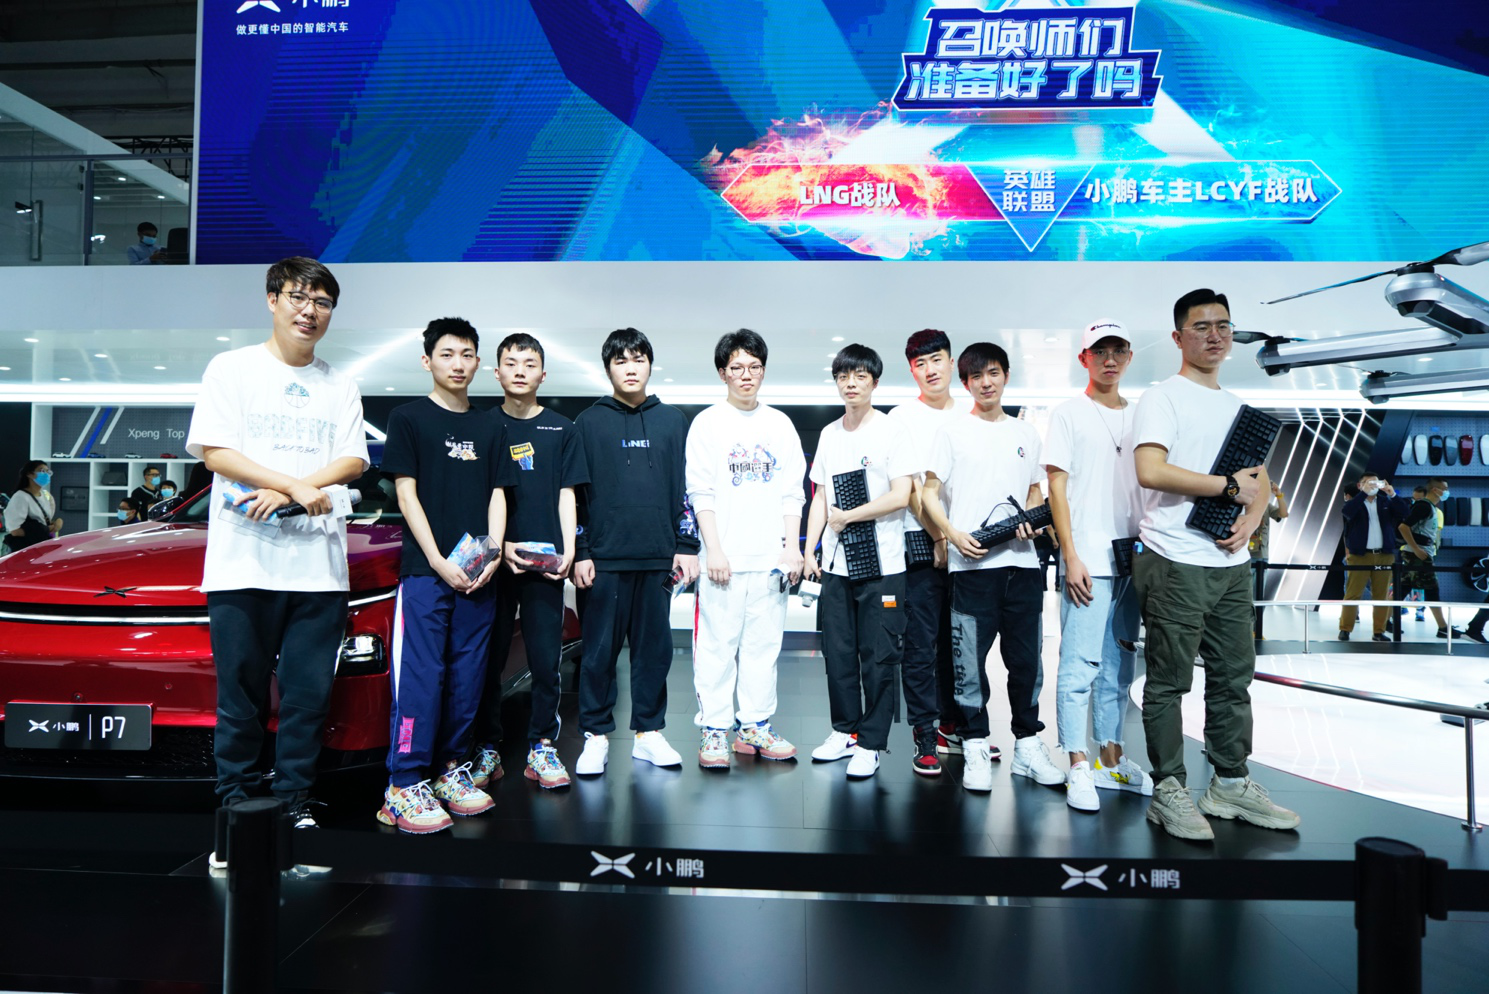 S10全民LOL 小鹏汽车车主战队与李宁LNG决胜北京车展